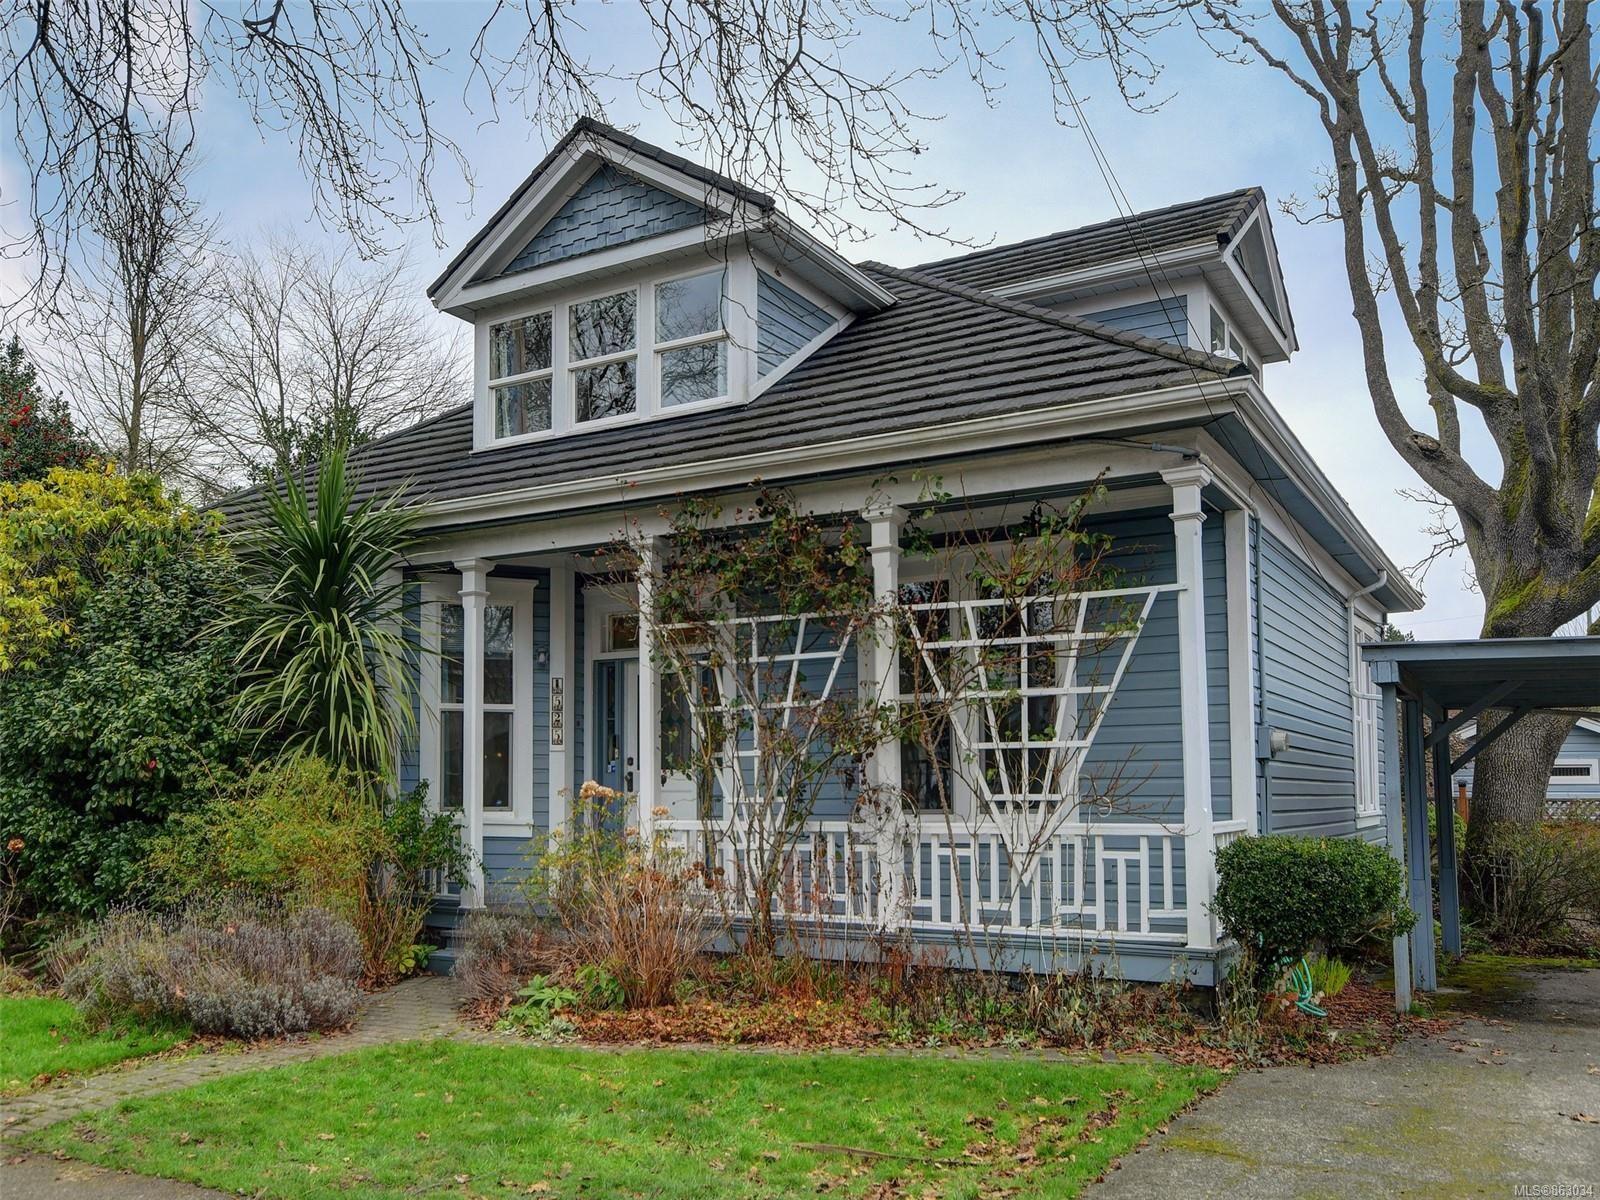 Main Photo: 1525 Davie St in : Vi Jubilee House for sale (Victoria)  : MLS®# 863034